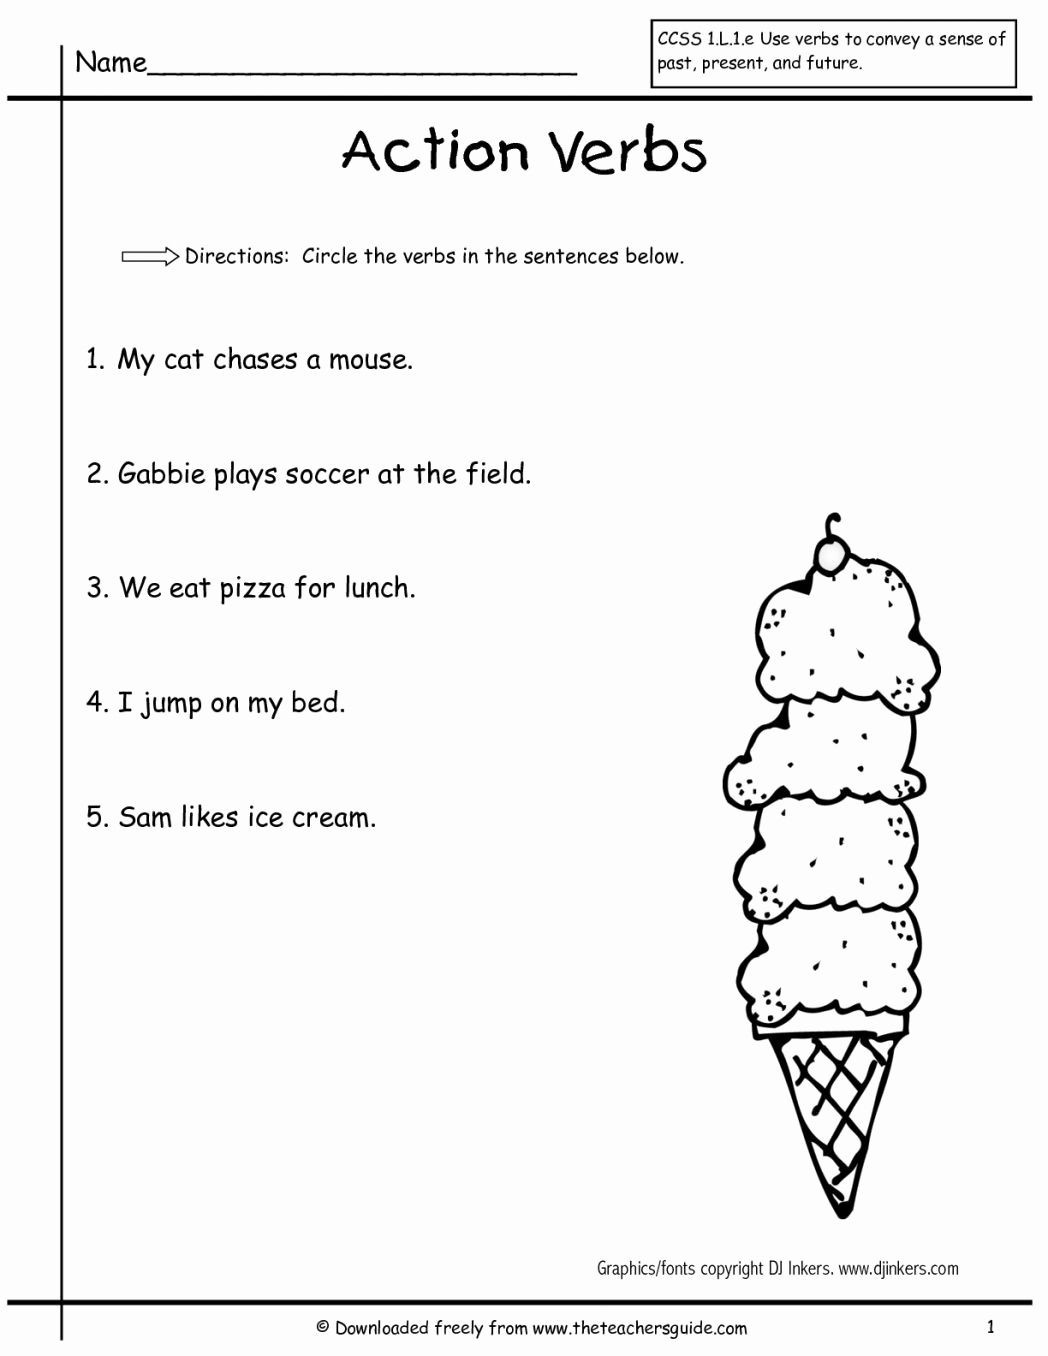 Verbs Worksheets for 1st Grade First Grade Verb Worksheets